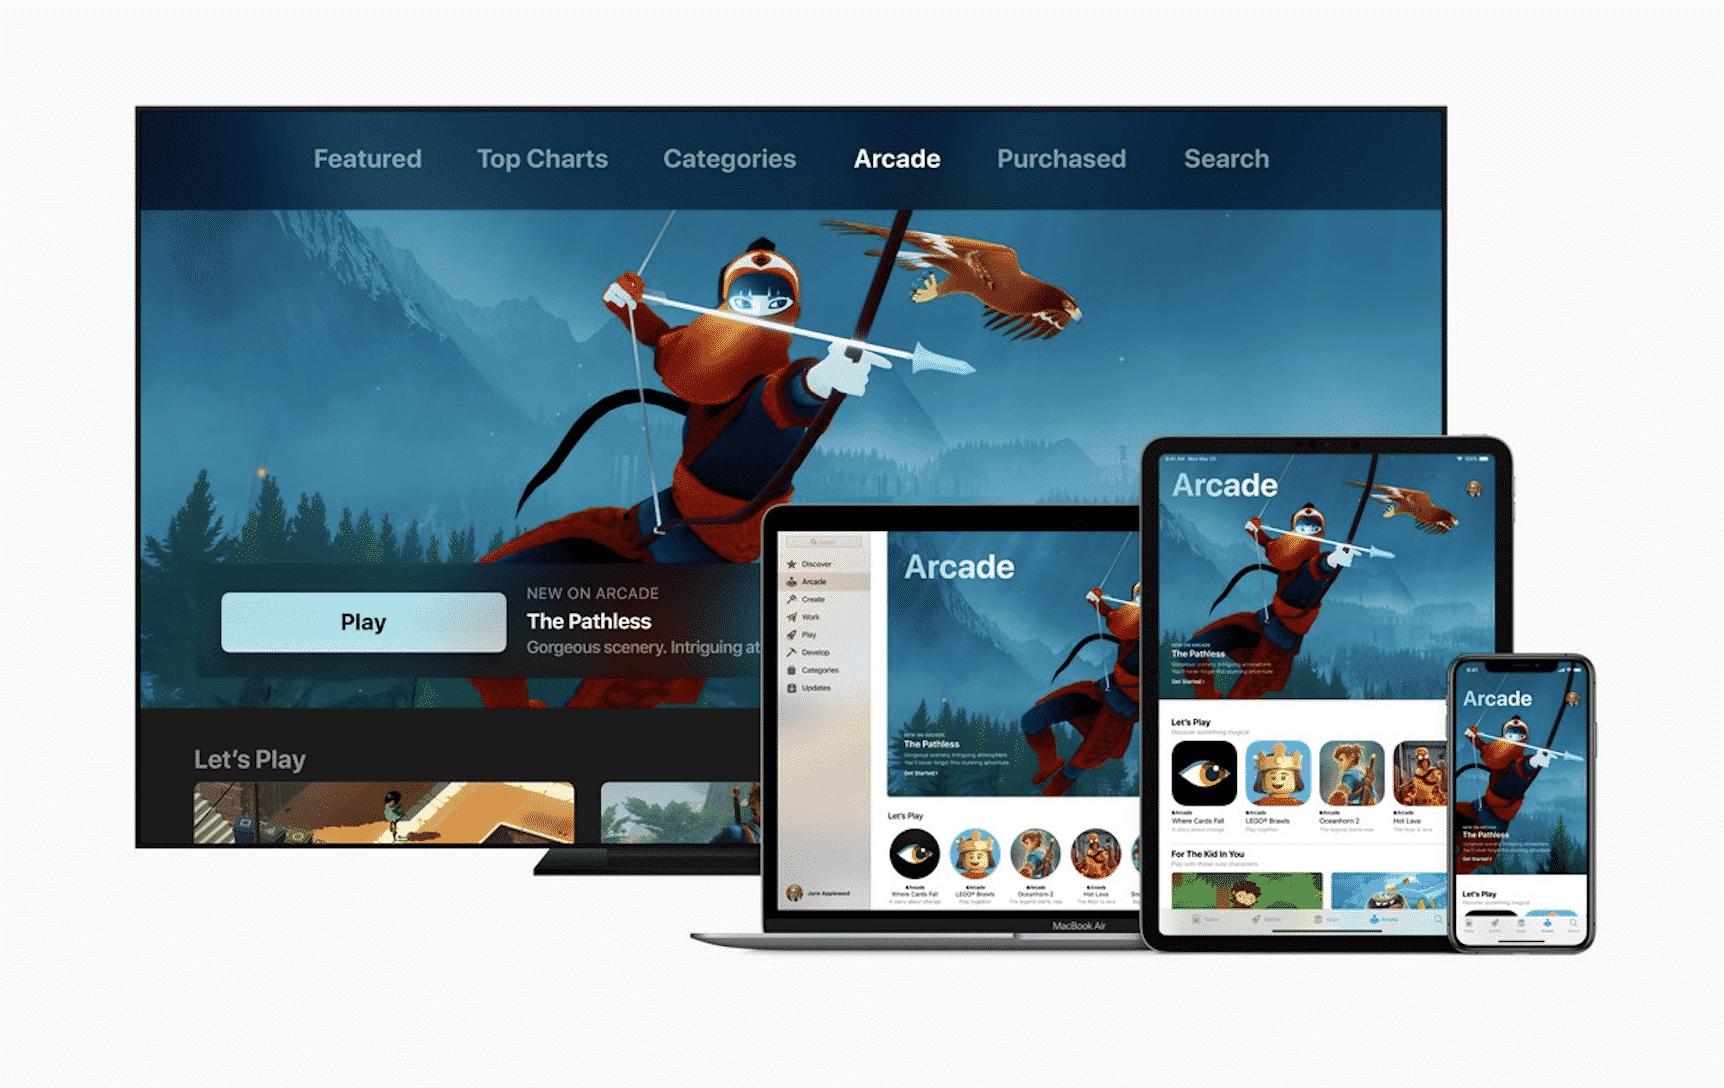 Apple's Gaming